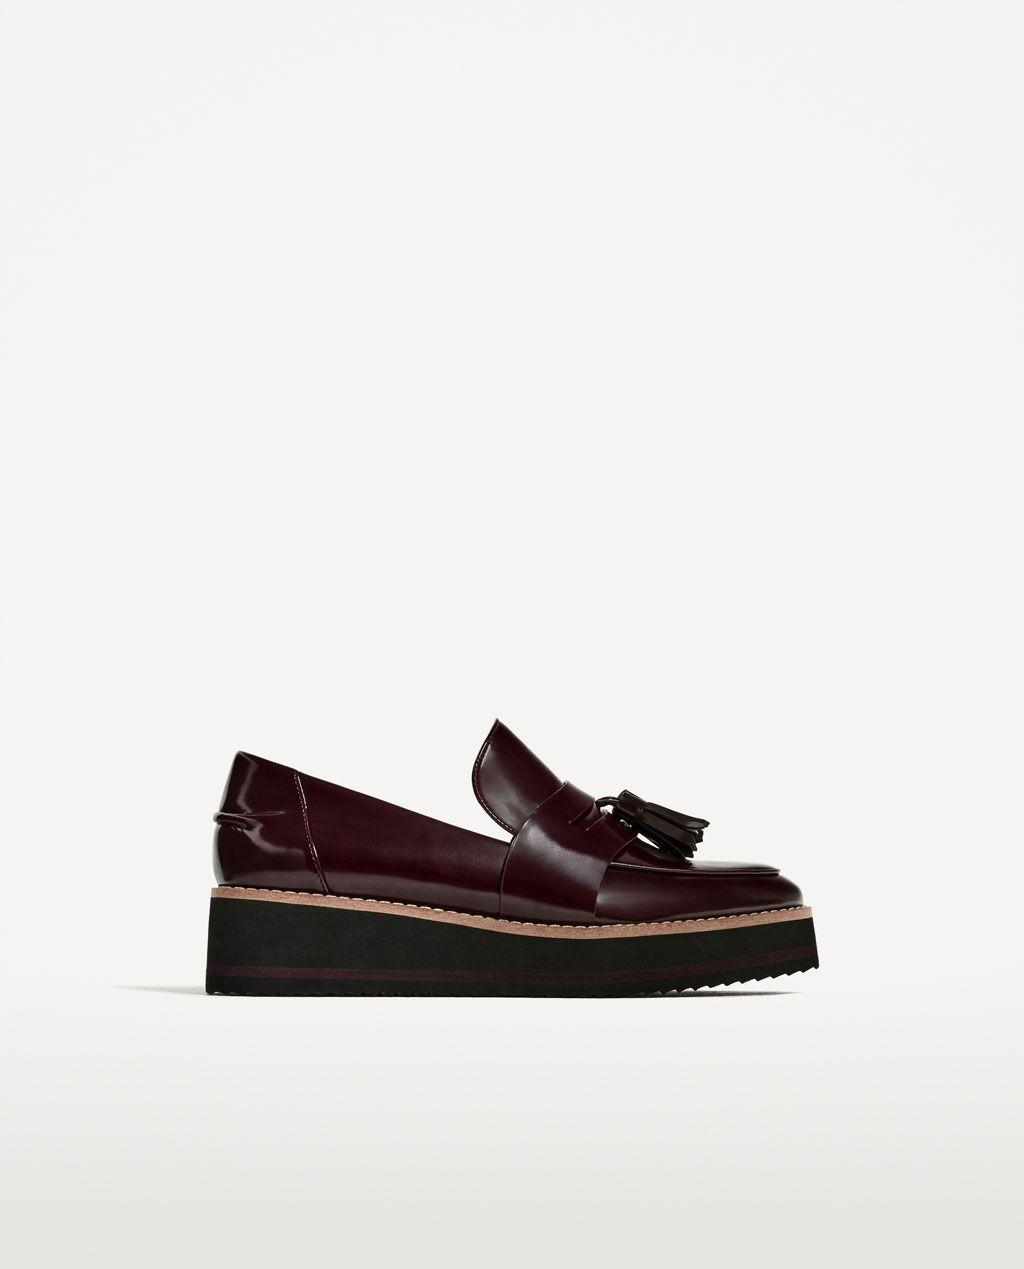 02887ce48ec  50 Zara loafers FLATFORM LOAFERS-SHOES-WOMAN